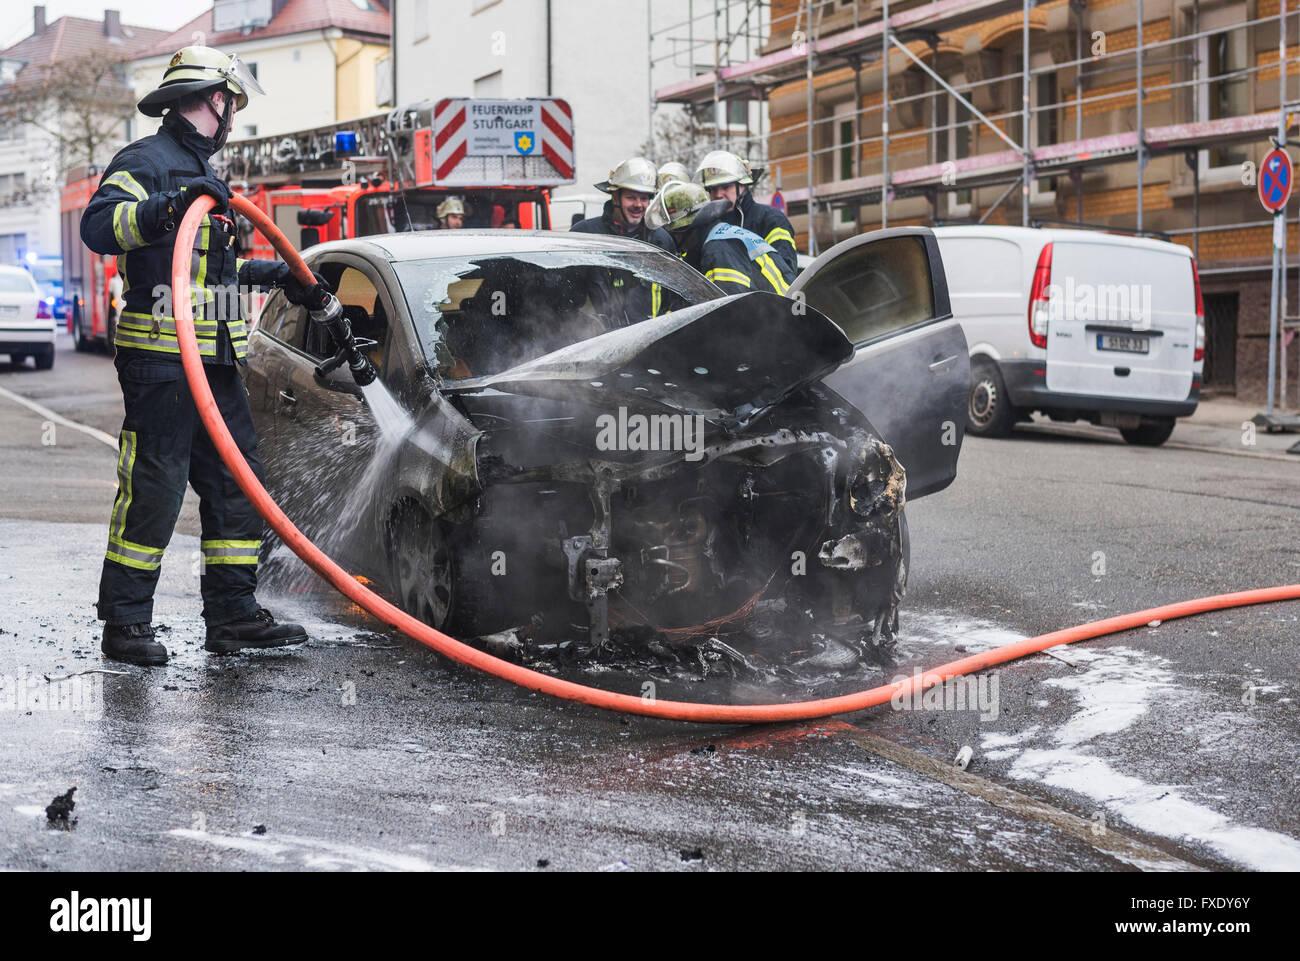 El departamento de bomberos extinguir un ardor Corsa, quemó el compartimento del motor, Stuttgart, Baden-Württemberg, Imagen De Stock